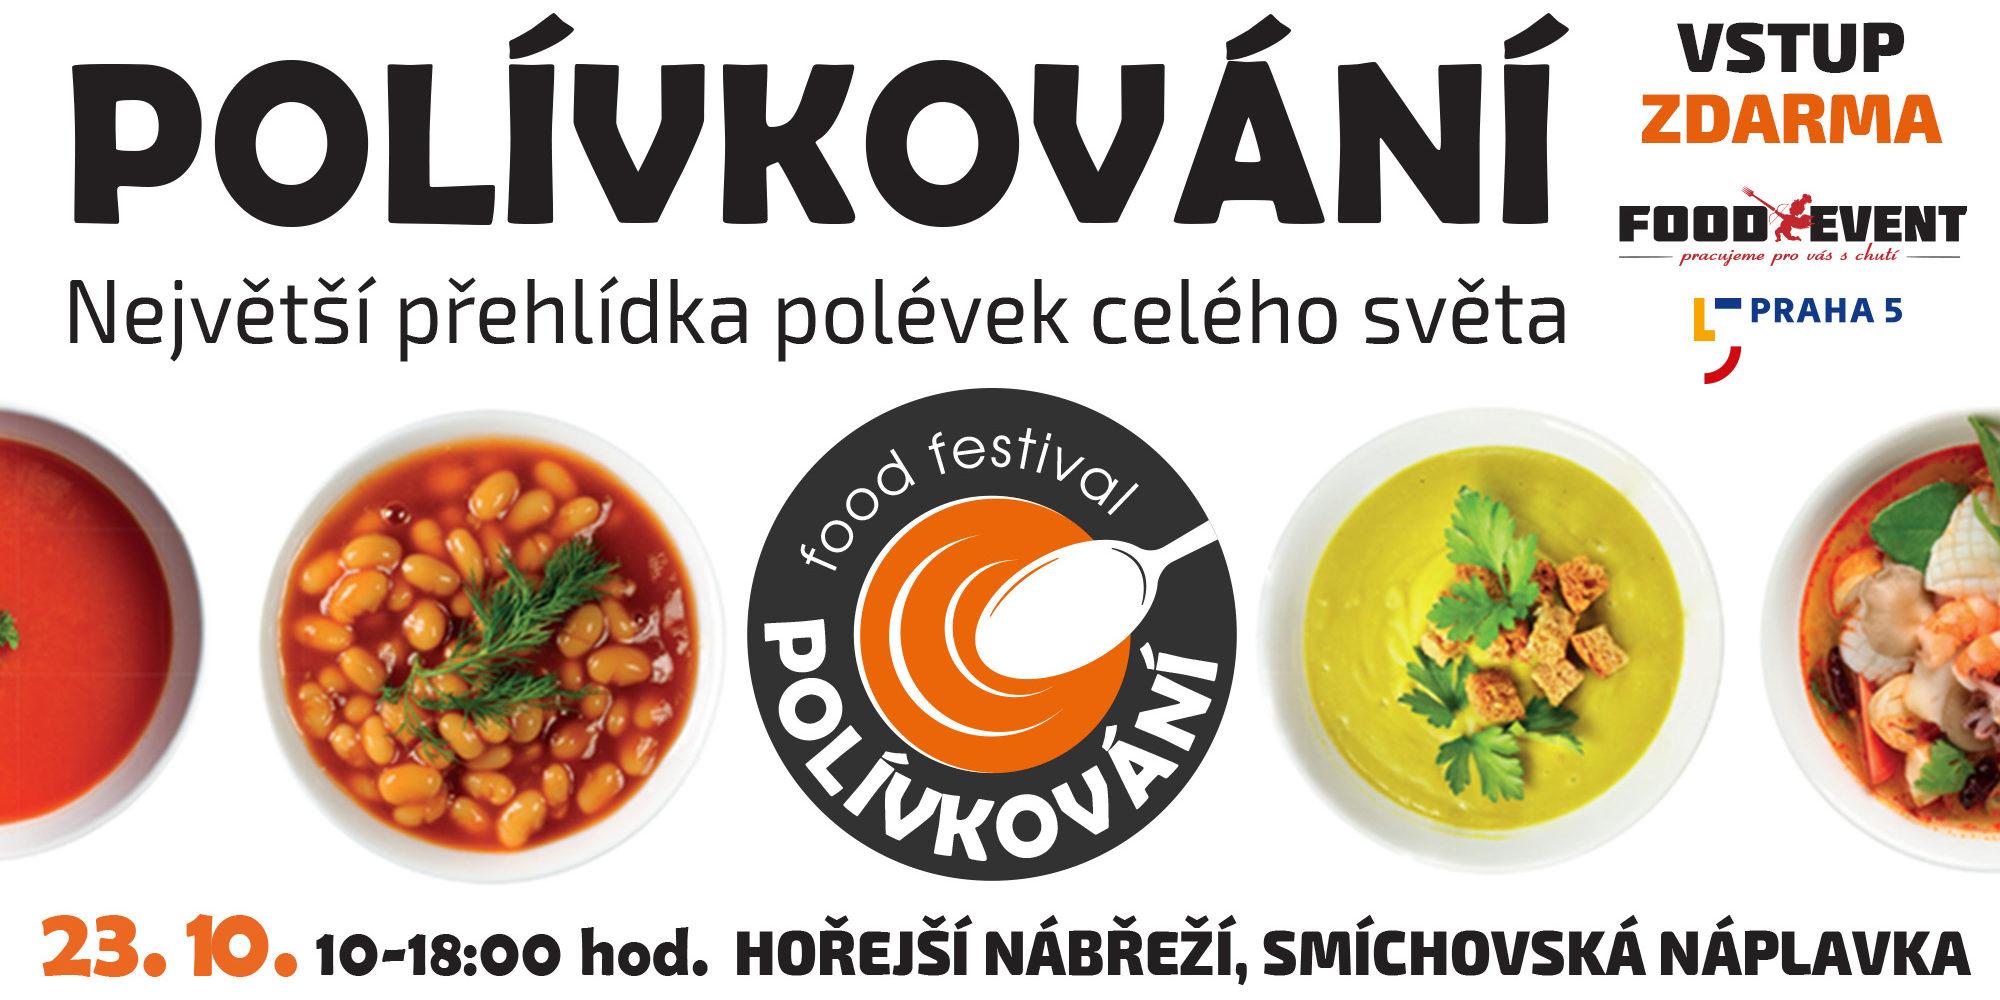 polivkovani-na-smichovske-naplavce-v-sobotu-23-10-2021